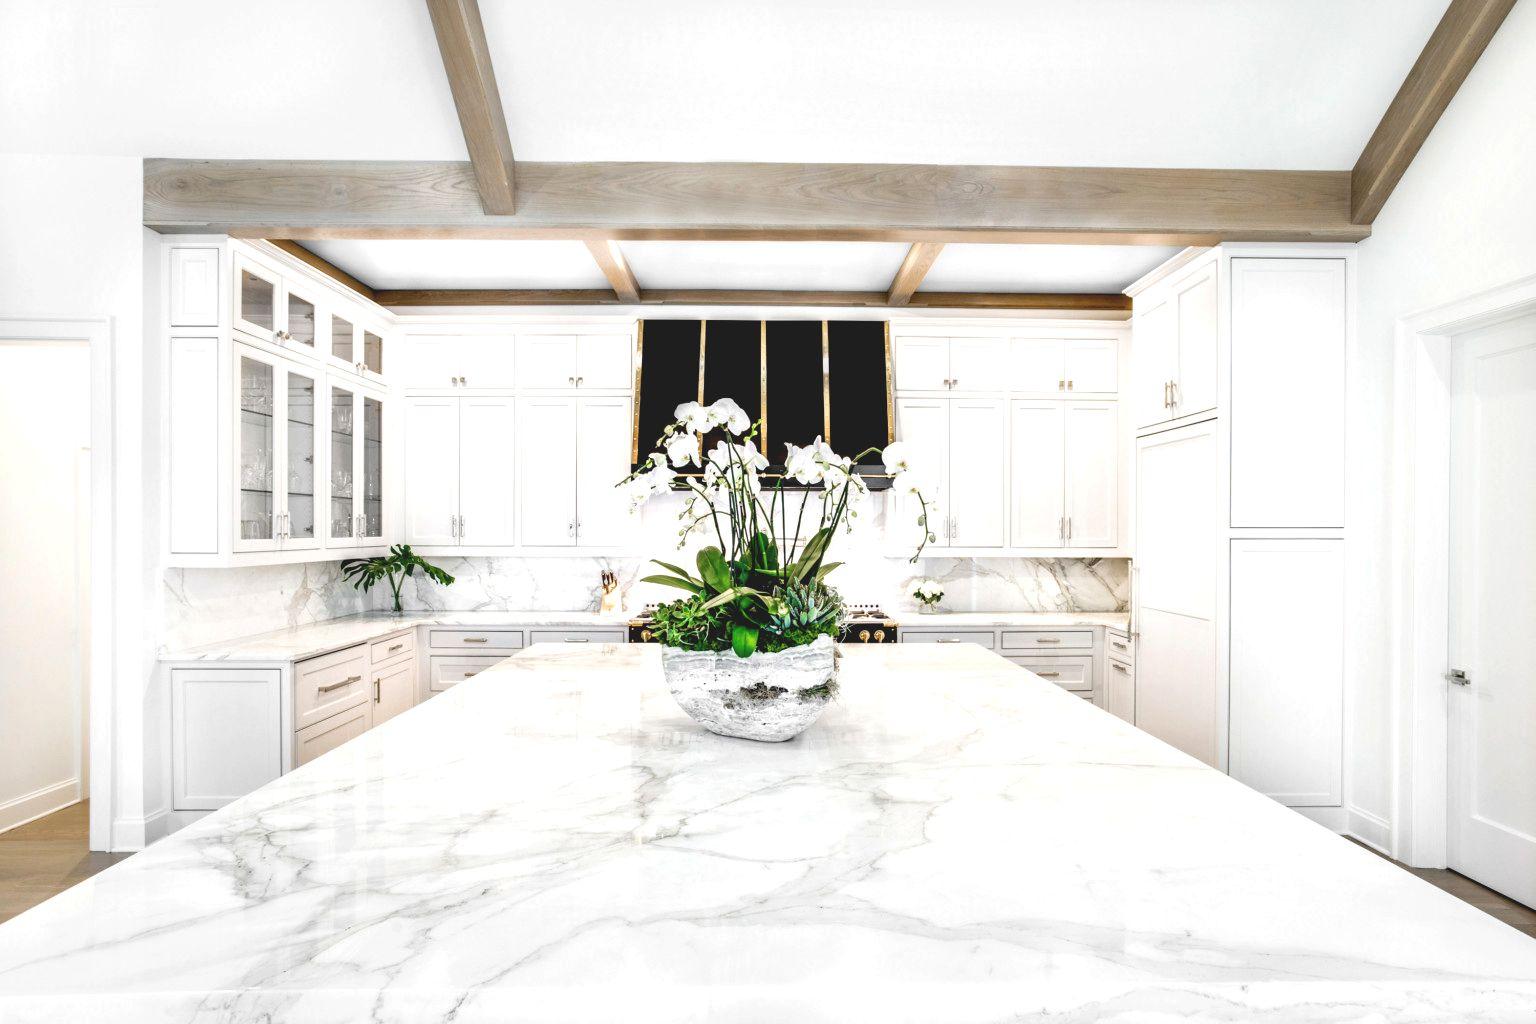 Aria Stone Gallery Gretchen Hiley Calacatta Gold Borghini Extra Marble Kitchen Blog